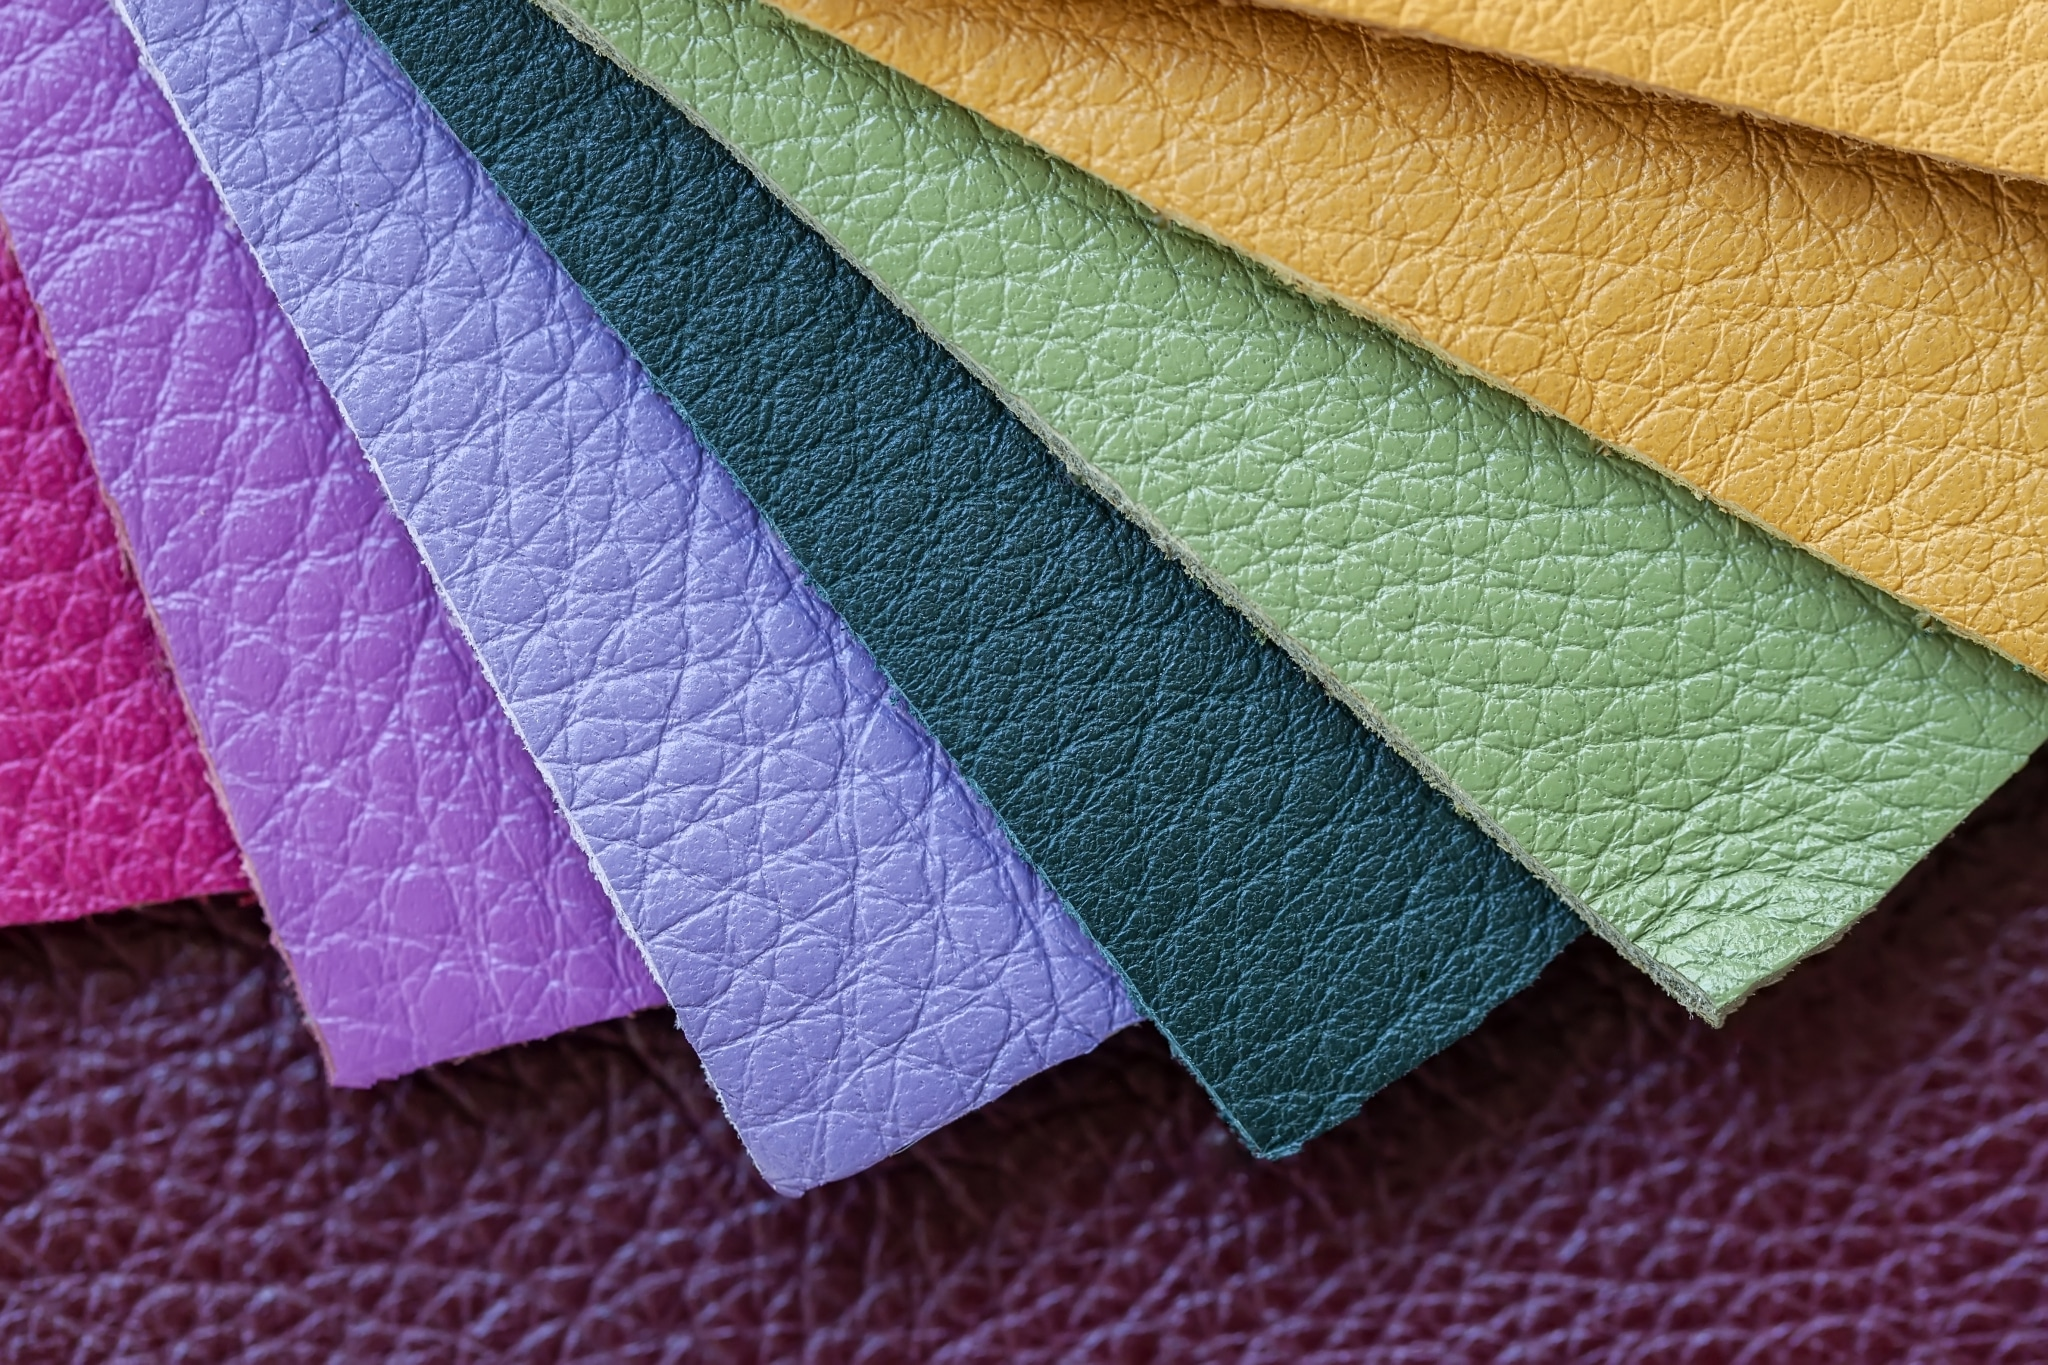 Bonacor. The 5-element-leather by Wollsdorf